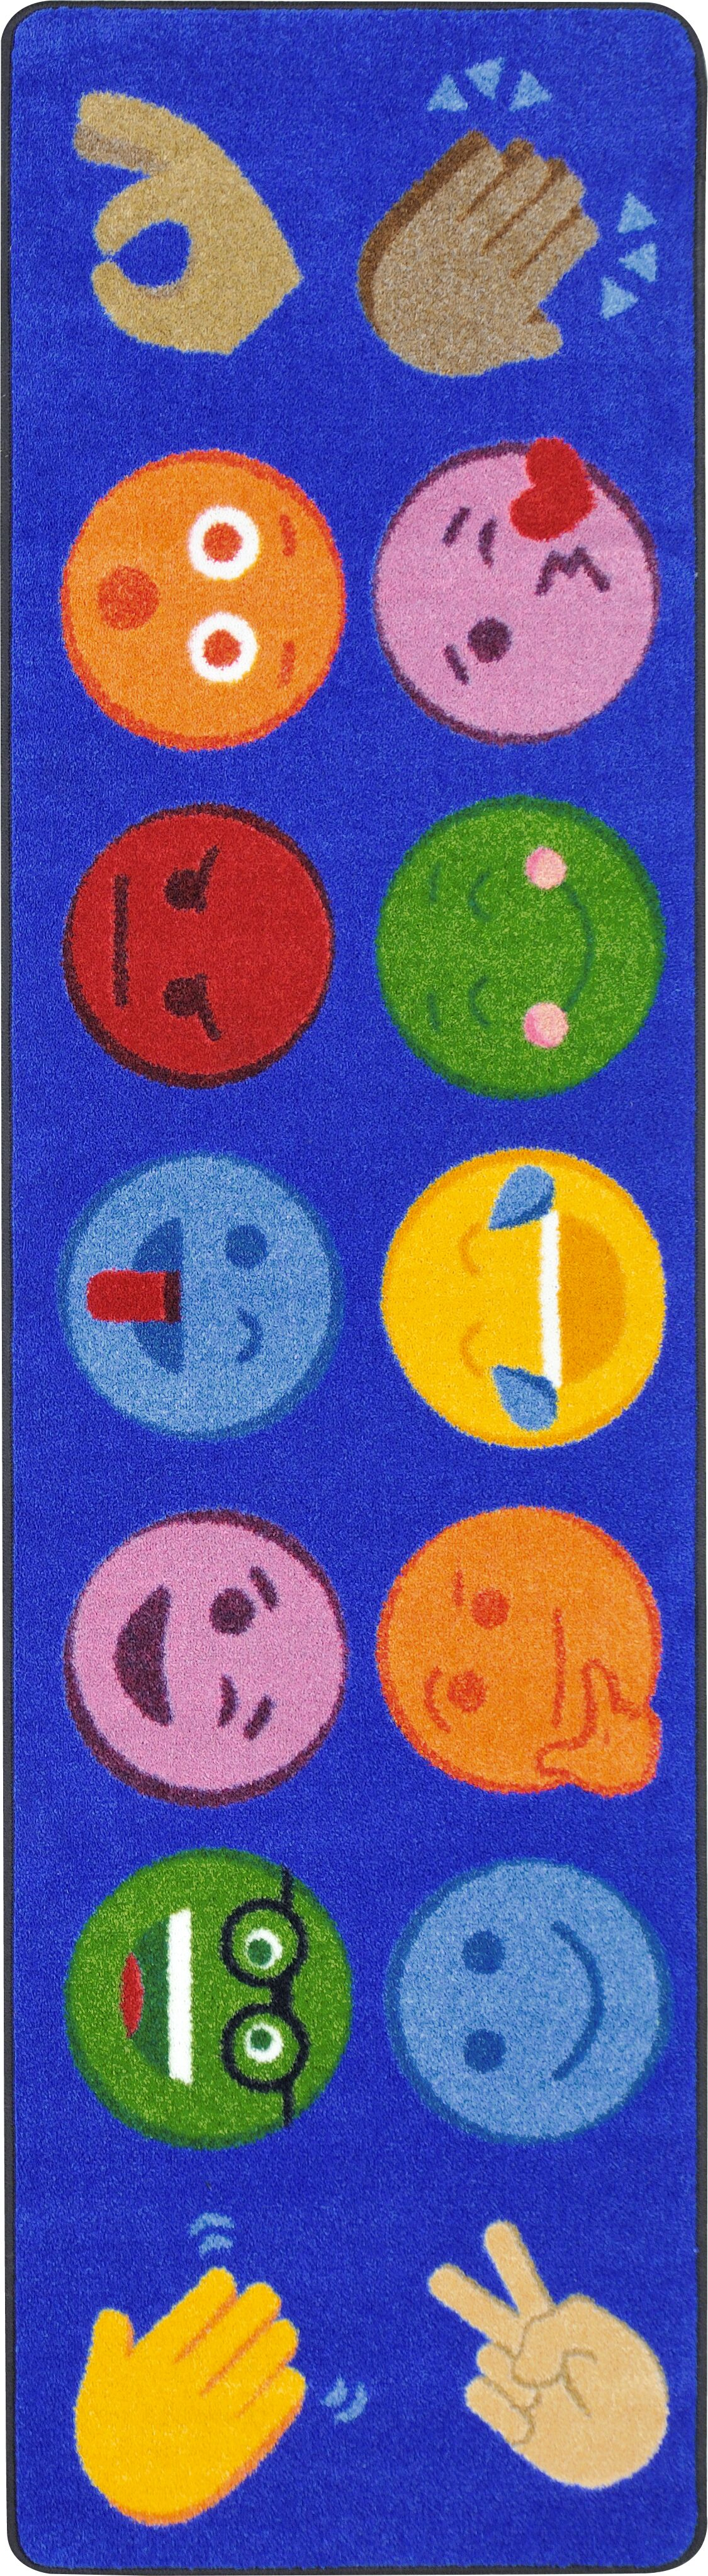 Emoji Expressions Blue Area Rug Rug Size: 2'8